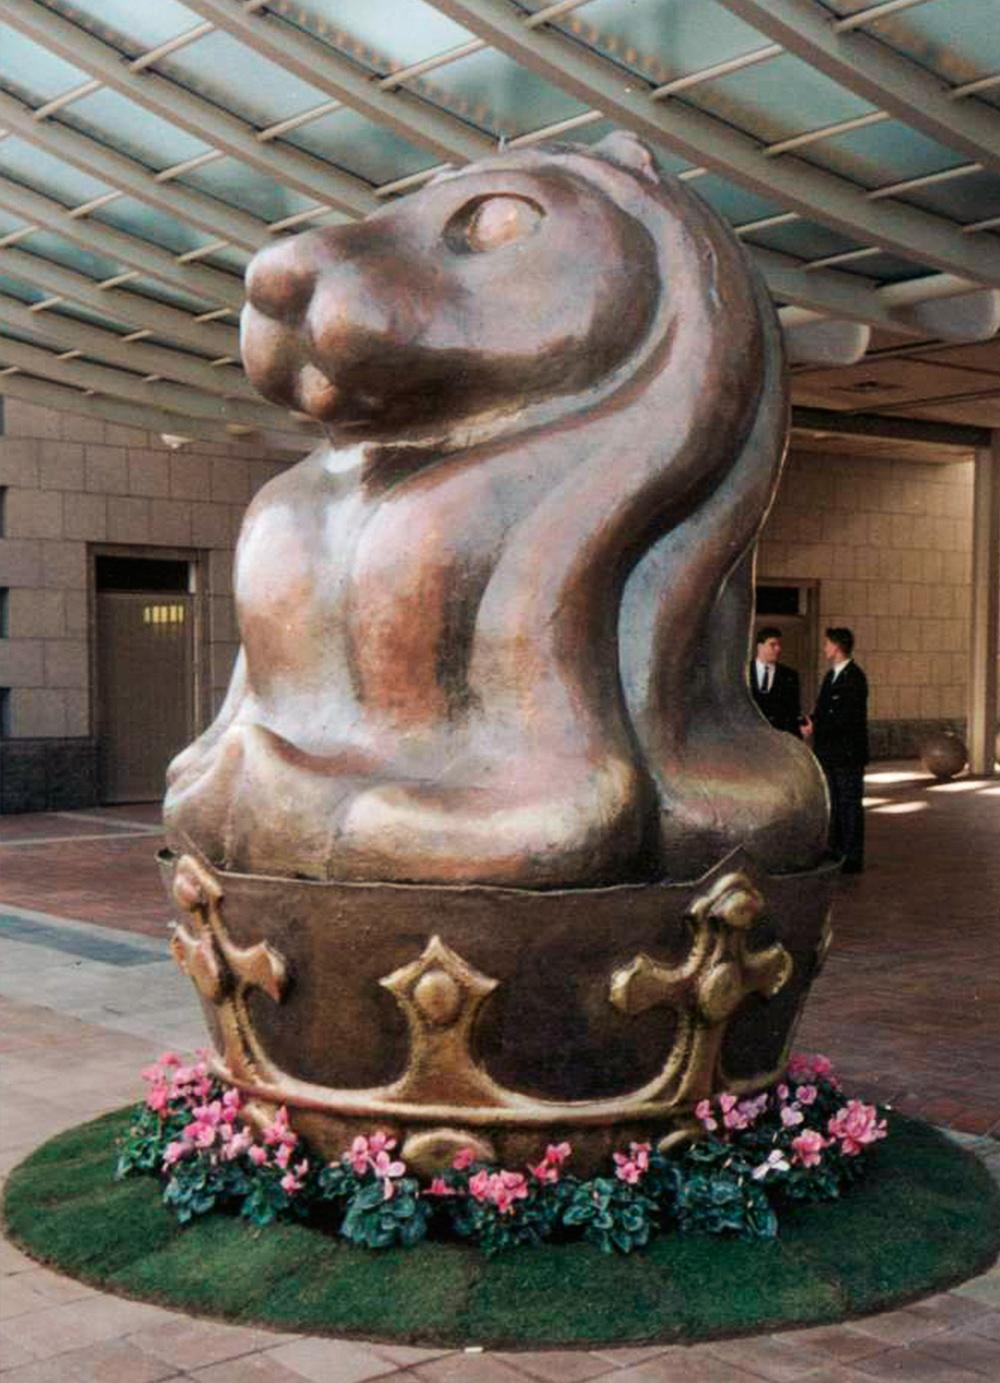 Escultura-Encargos-Hotel-Arts-C-RD.Escultor